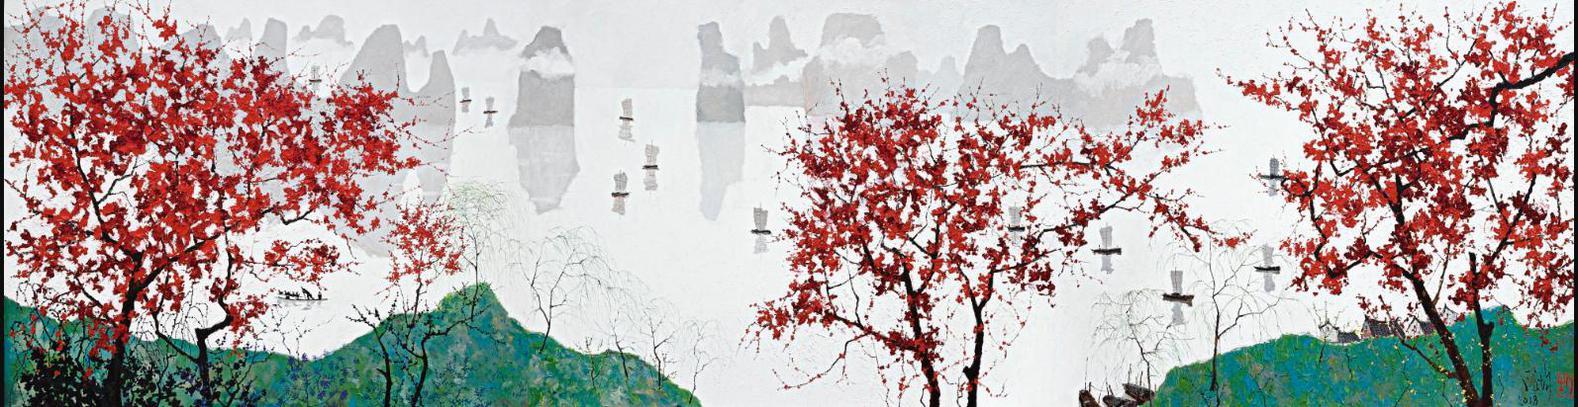 Pang Jiun-A Thousand Sails On The Spring Tide-2018